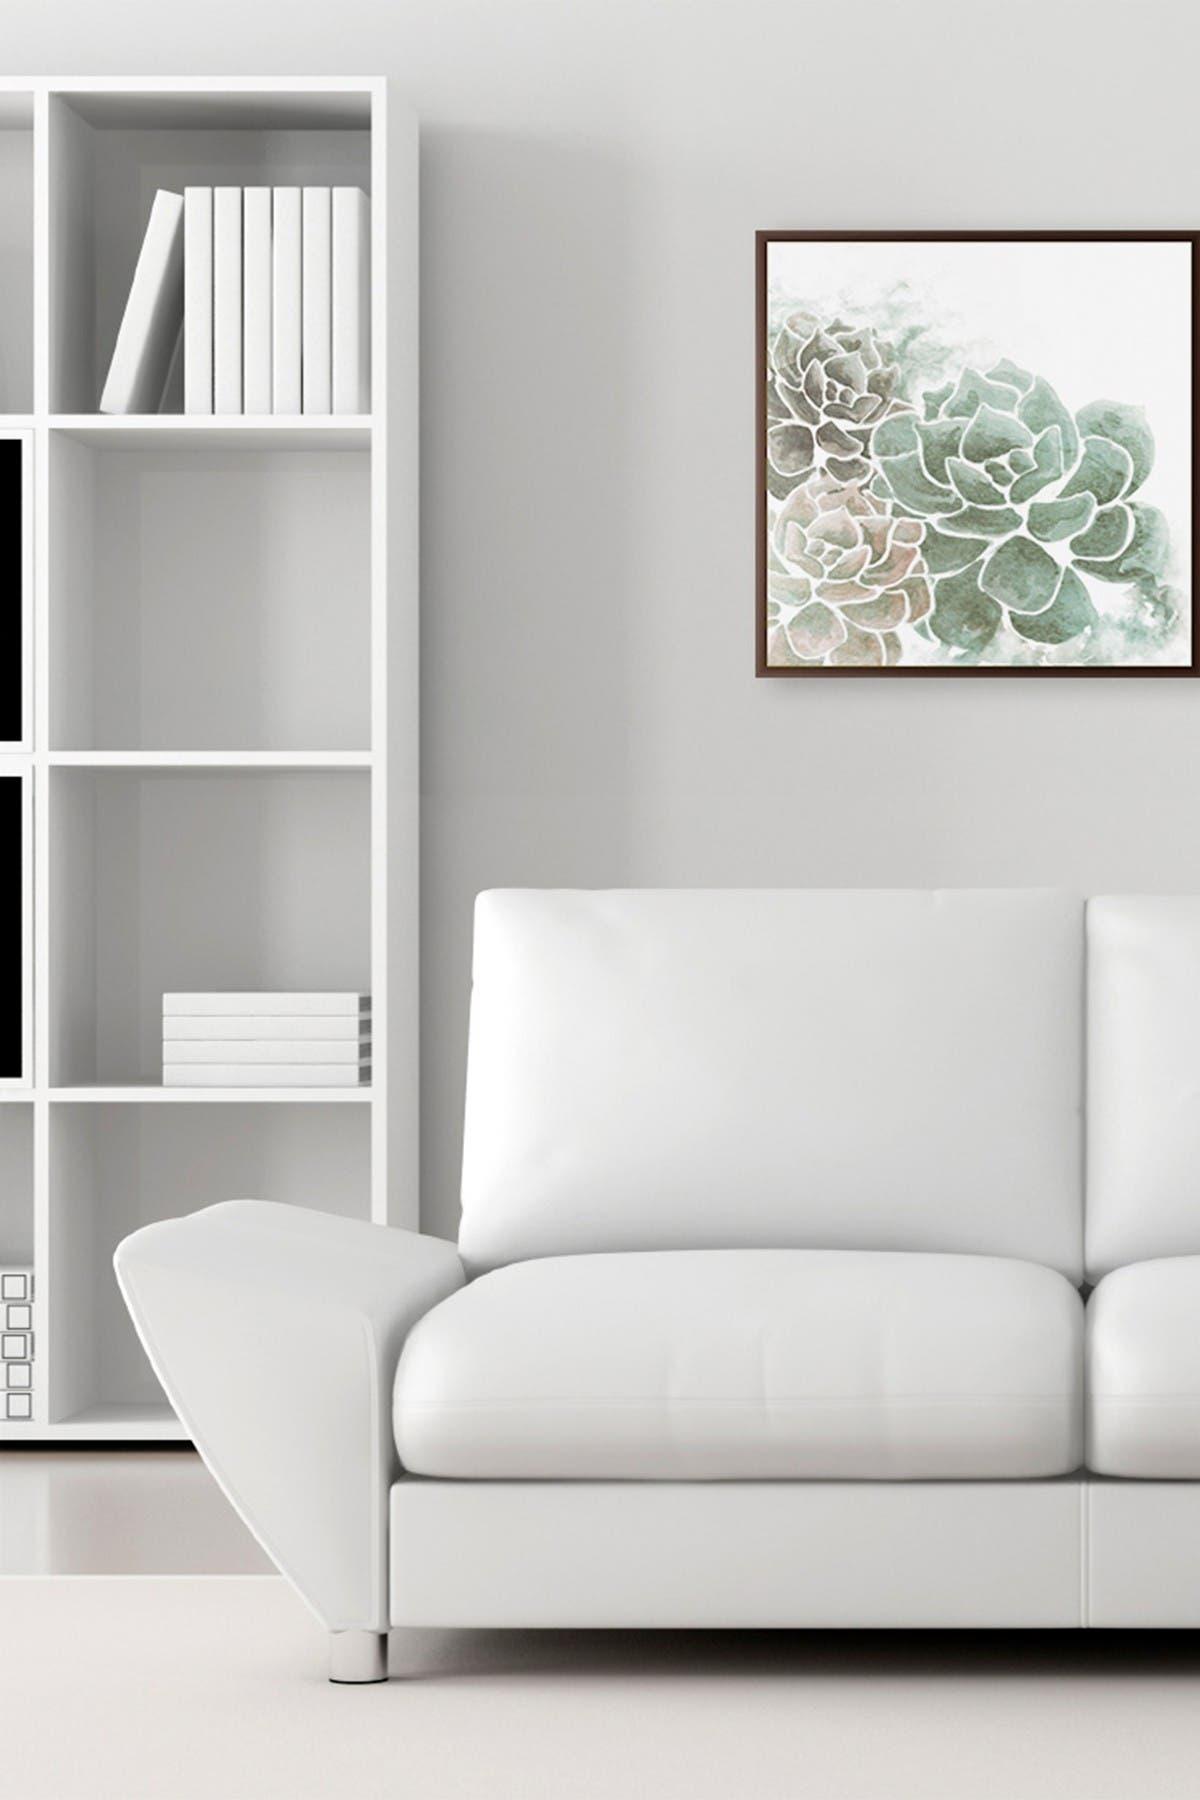 Image of PTM Images Medium Desert Succulents Canvas Wall Art